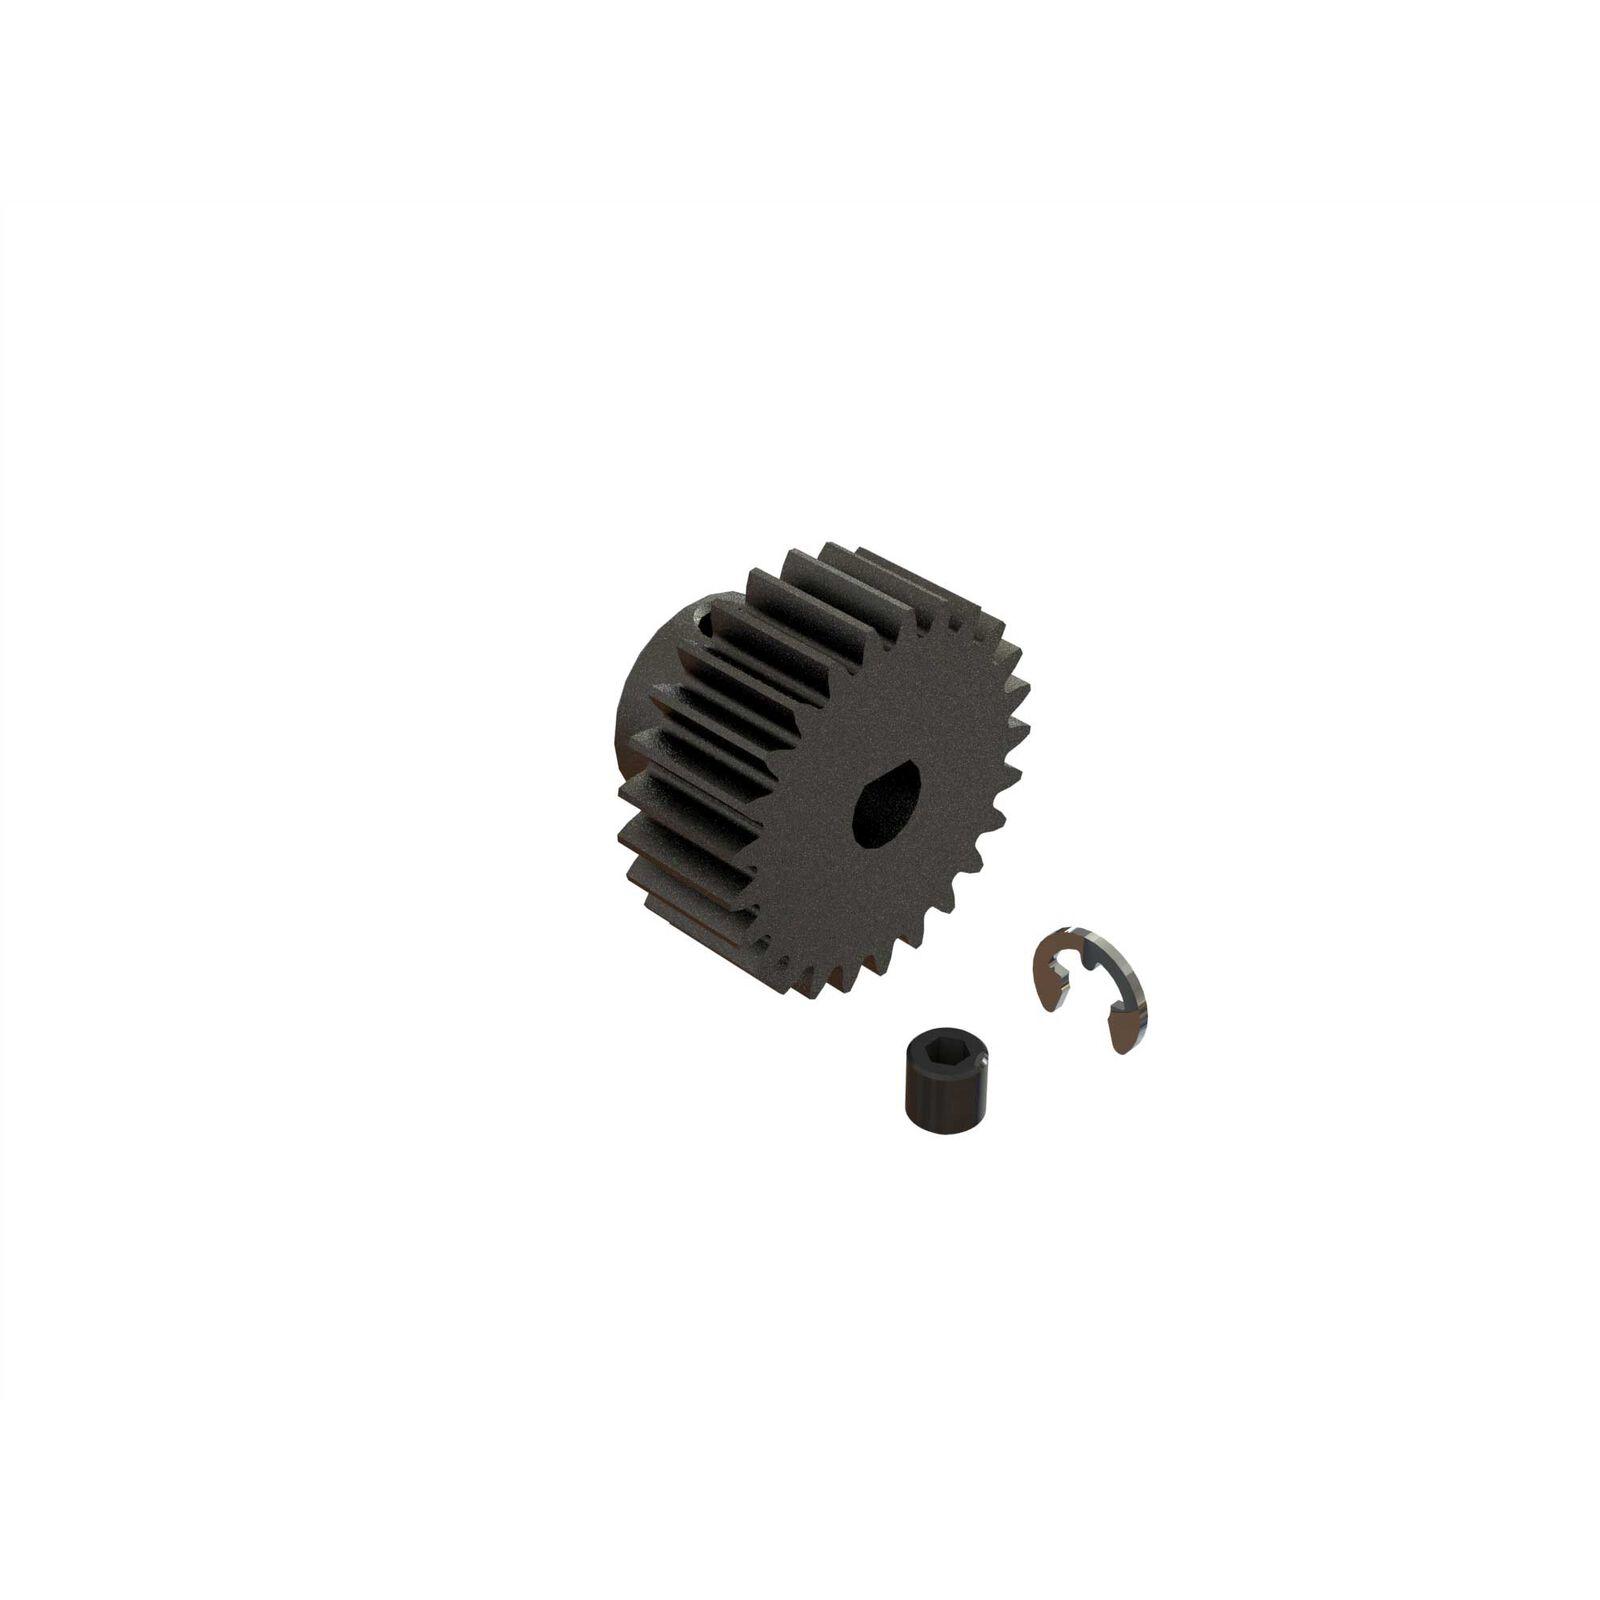 25T 0.8Mod Safe-D5 Pinion Gear